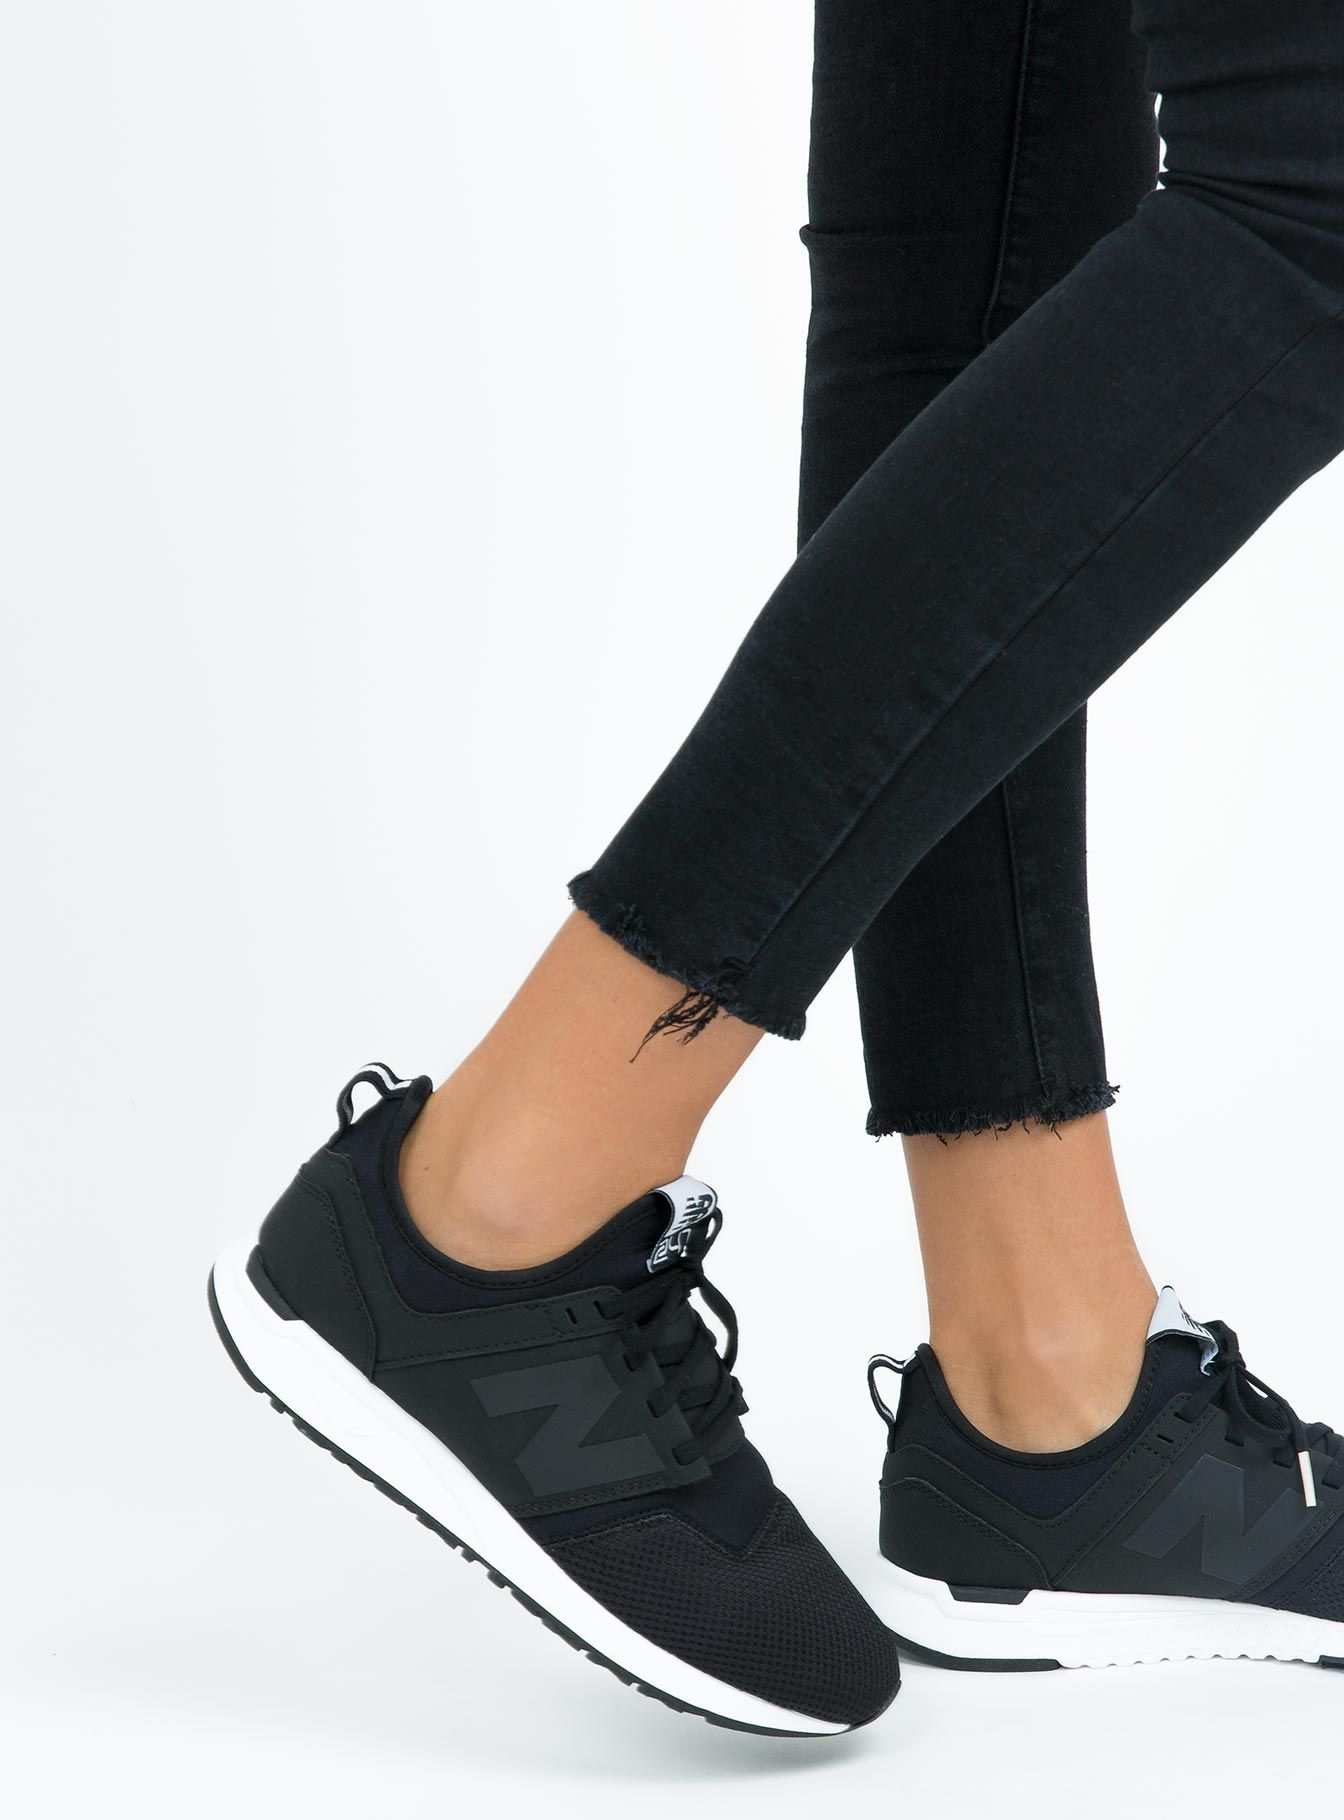 Women's New Balance 247 Classic Black | White shoes women ...